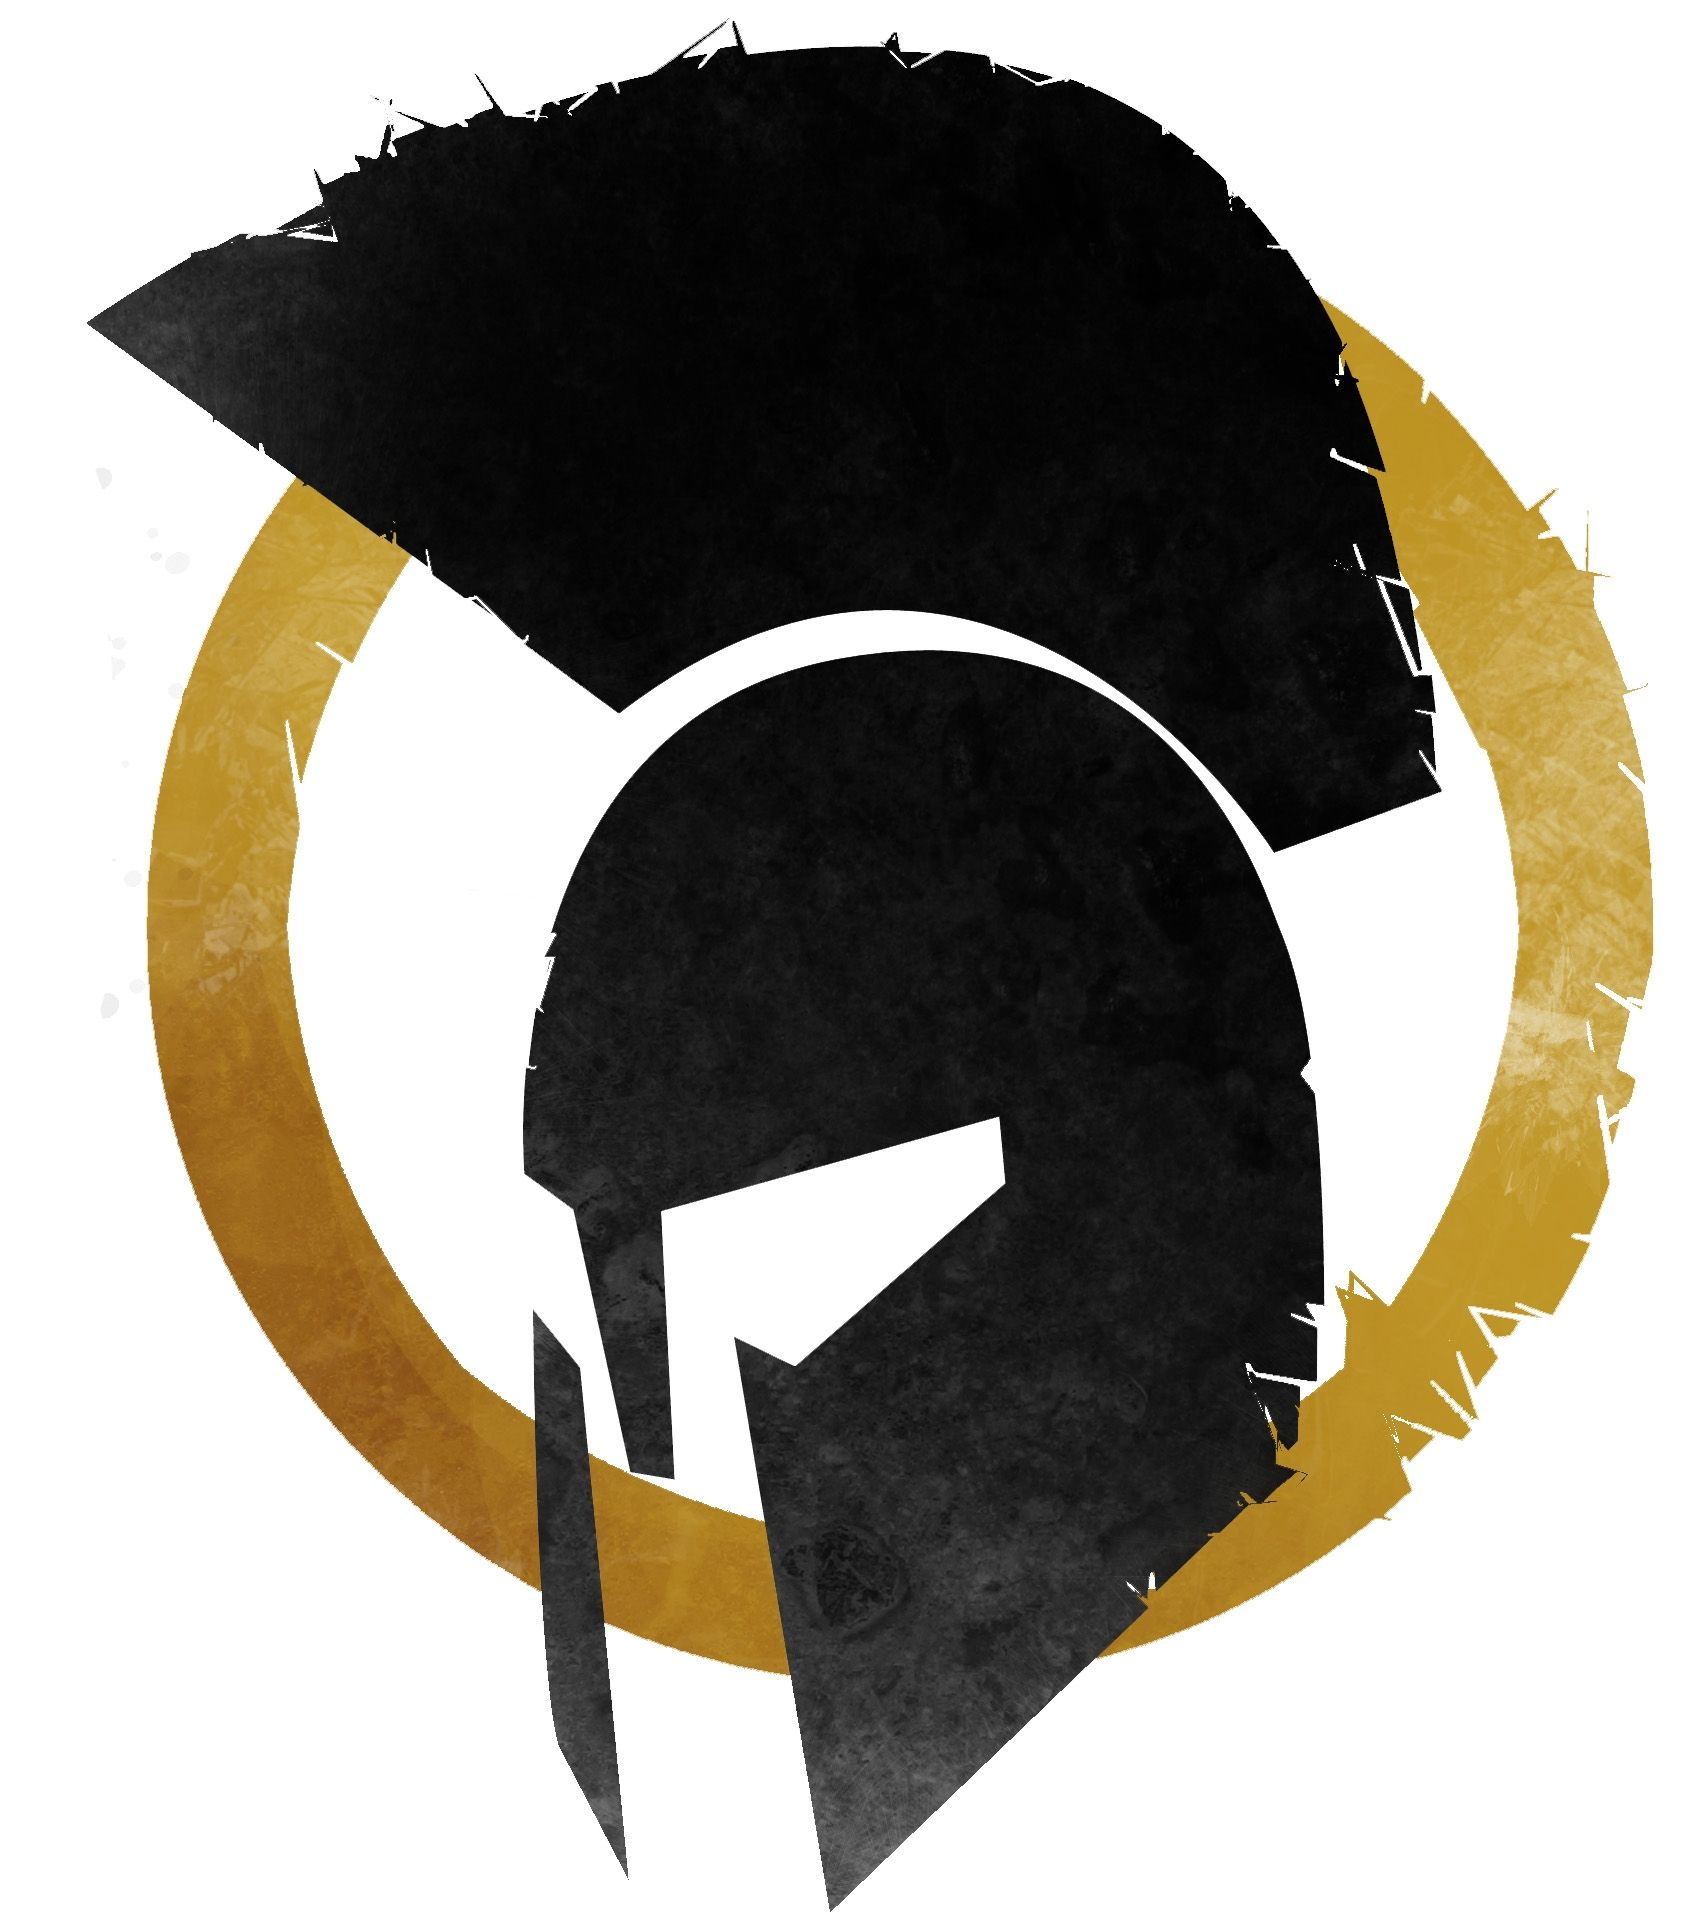 spartan logo - Recherche Google | Spartans | Pinterest | Logos ...